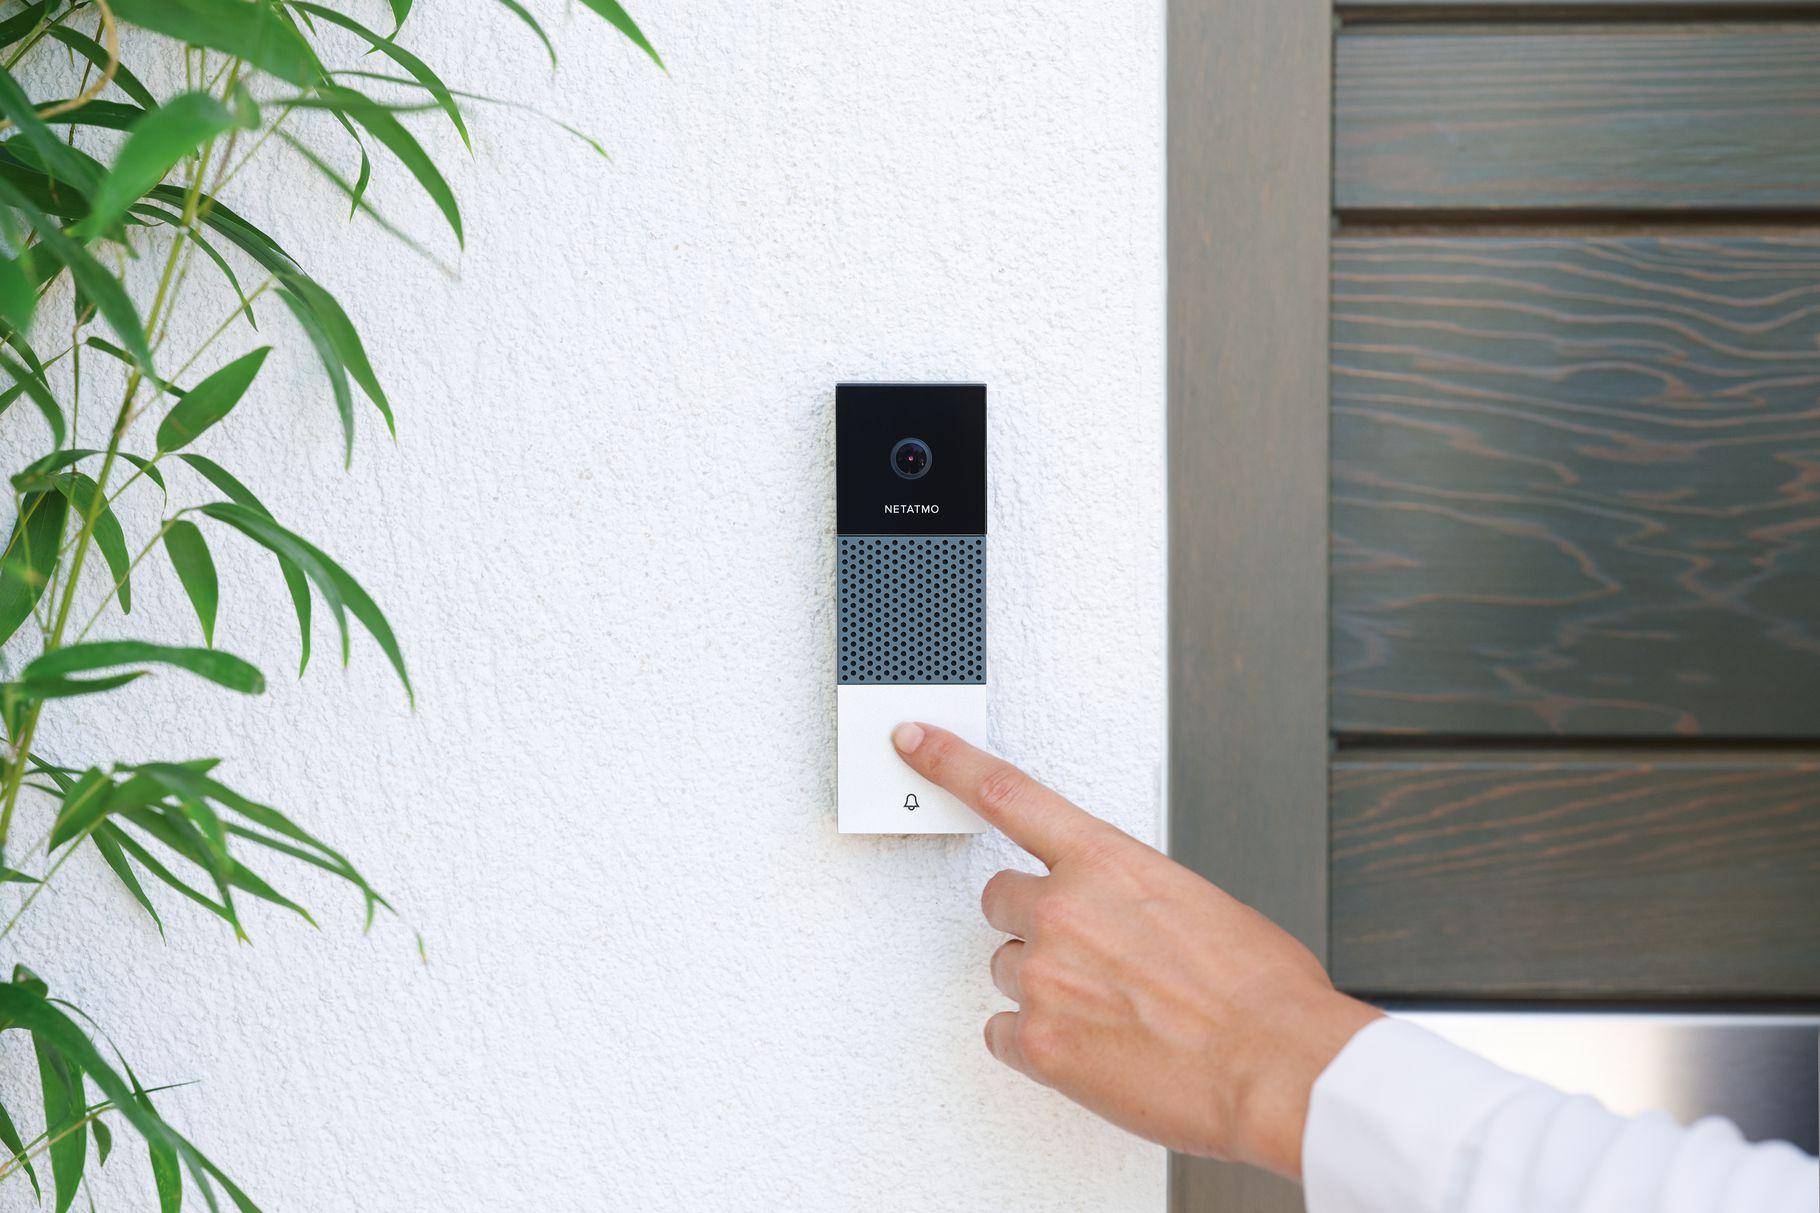 Netatmo Doorbell Hand WEB HD.0 - Zhrnutie: To najlepšie z CES 2019